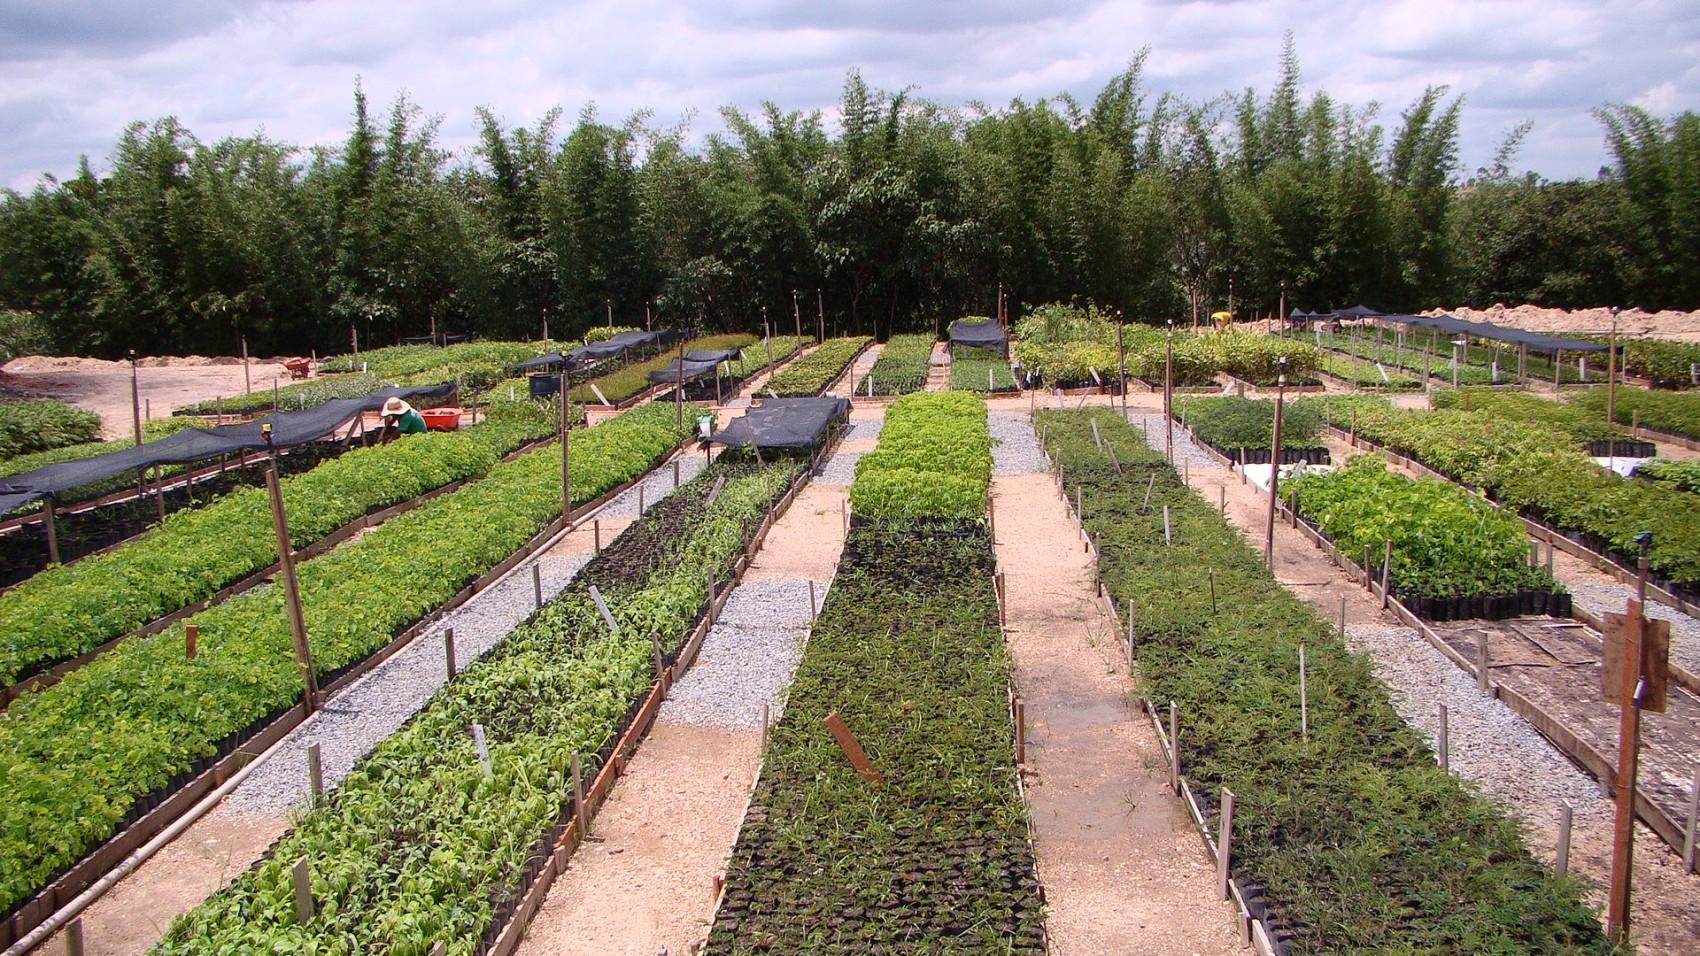 Foto 2 – Canteiros de mudas nativas no Viveiro Árvores Brasileiras, parceiro do Programa Muda Certa (Foto: Suzana Aleixo).